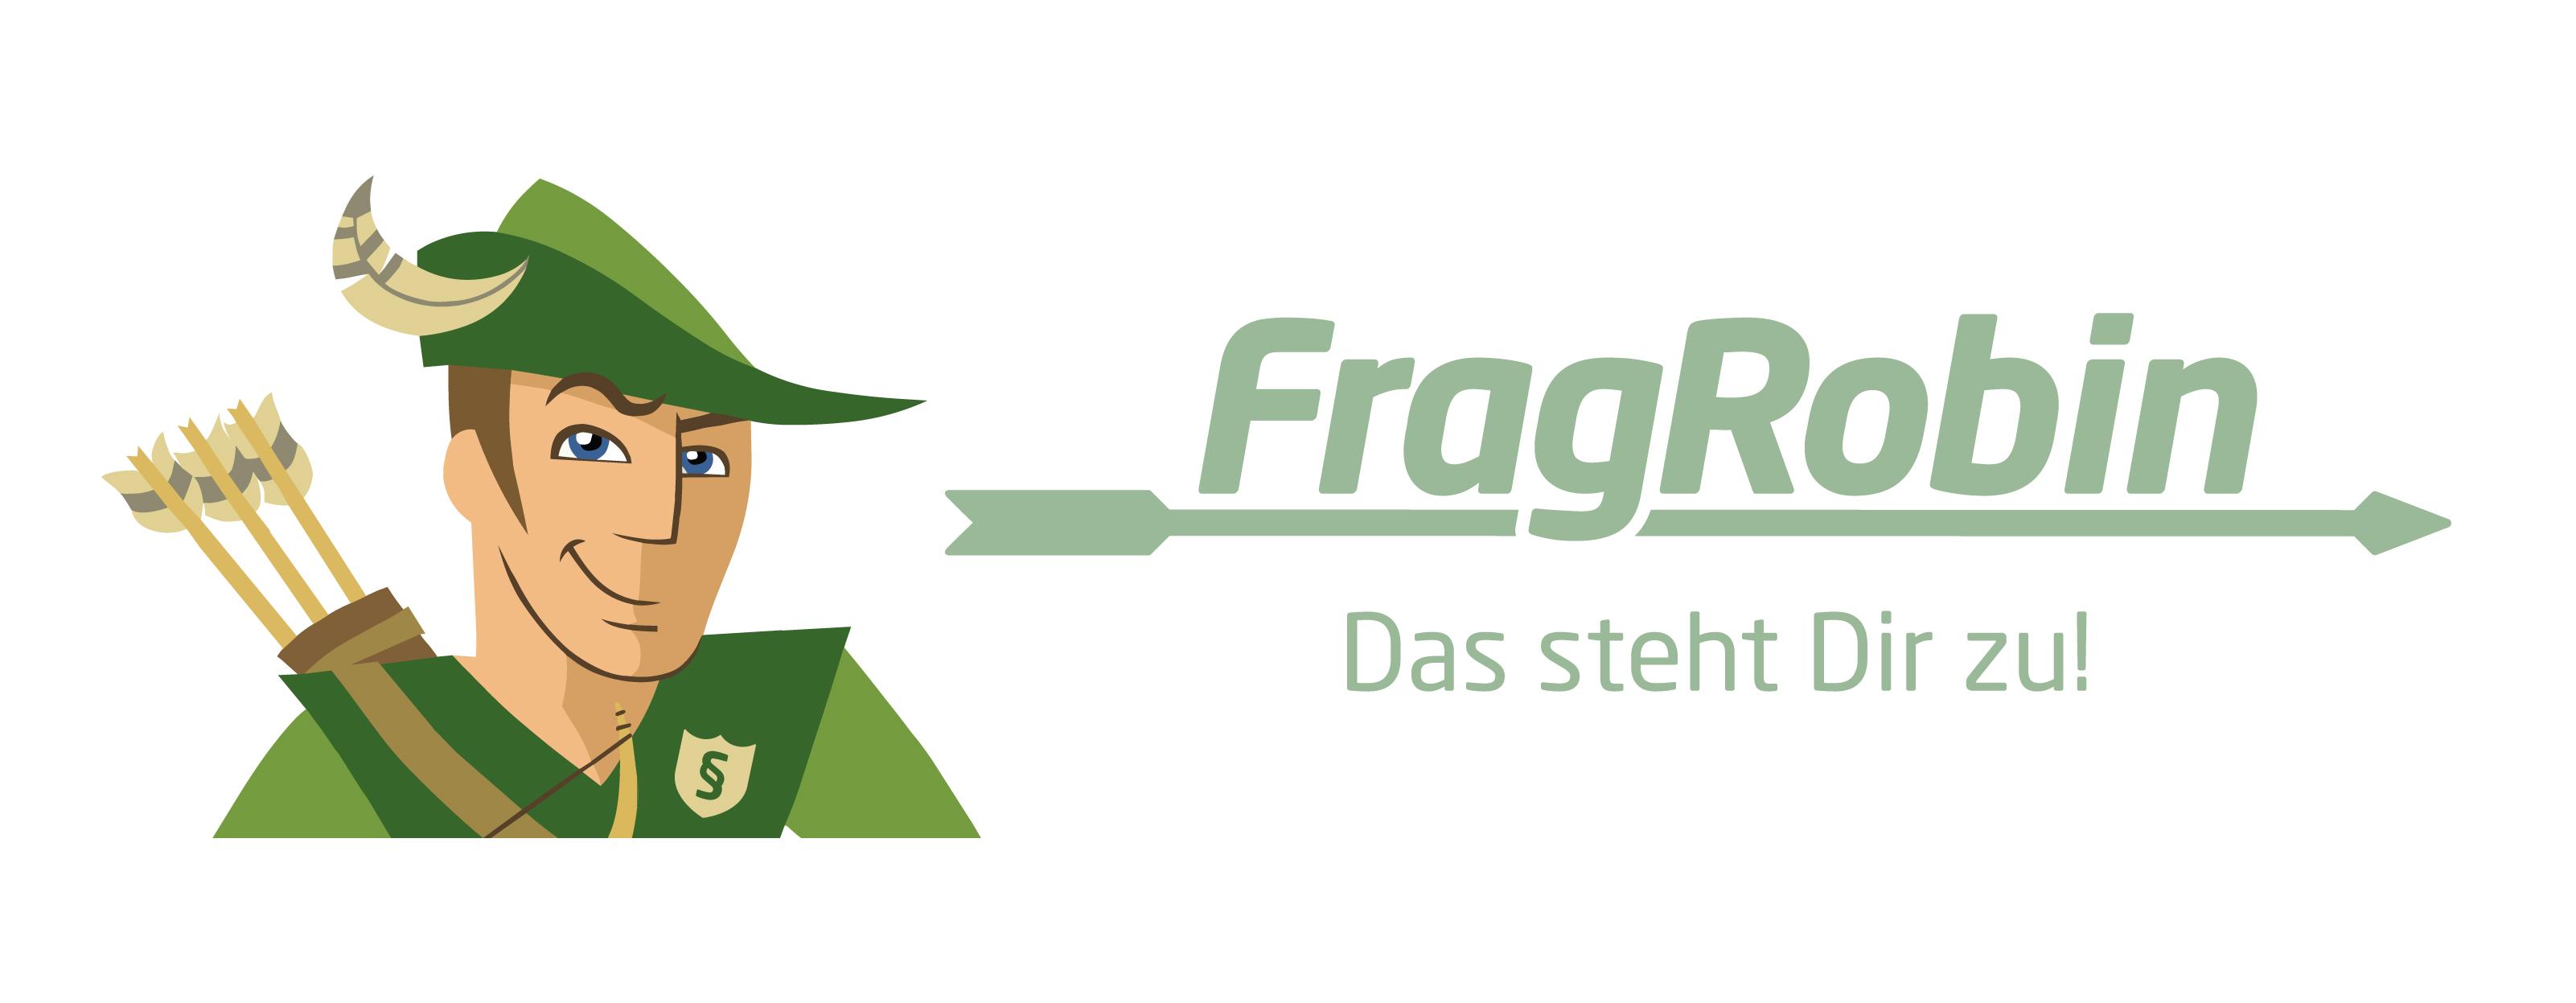 FragRobin-Banner-112x43-White-+-Typologo-+-Claim